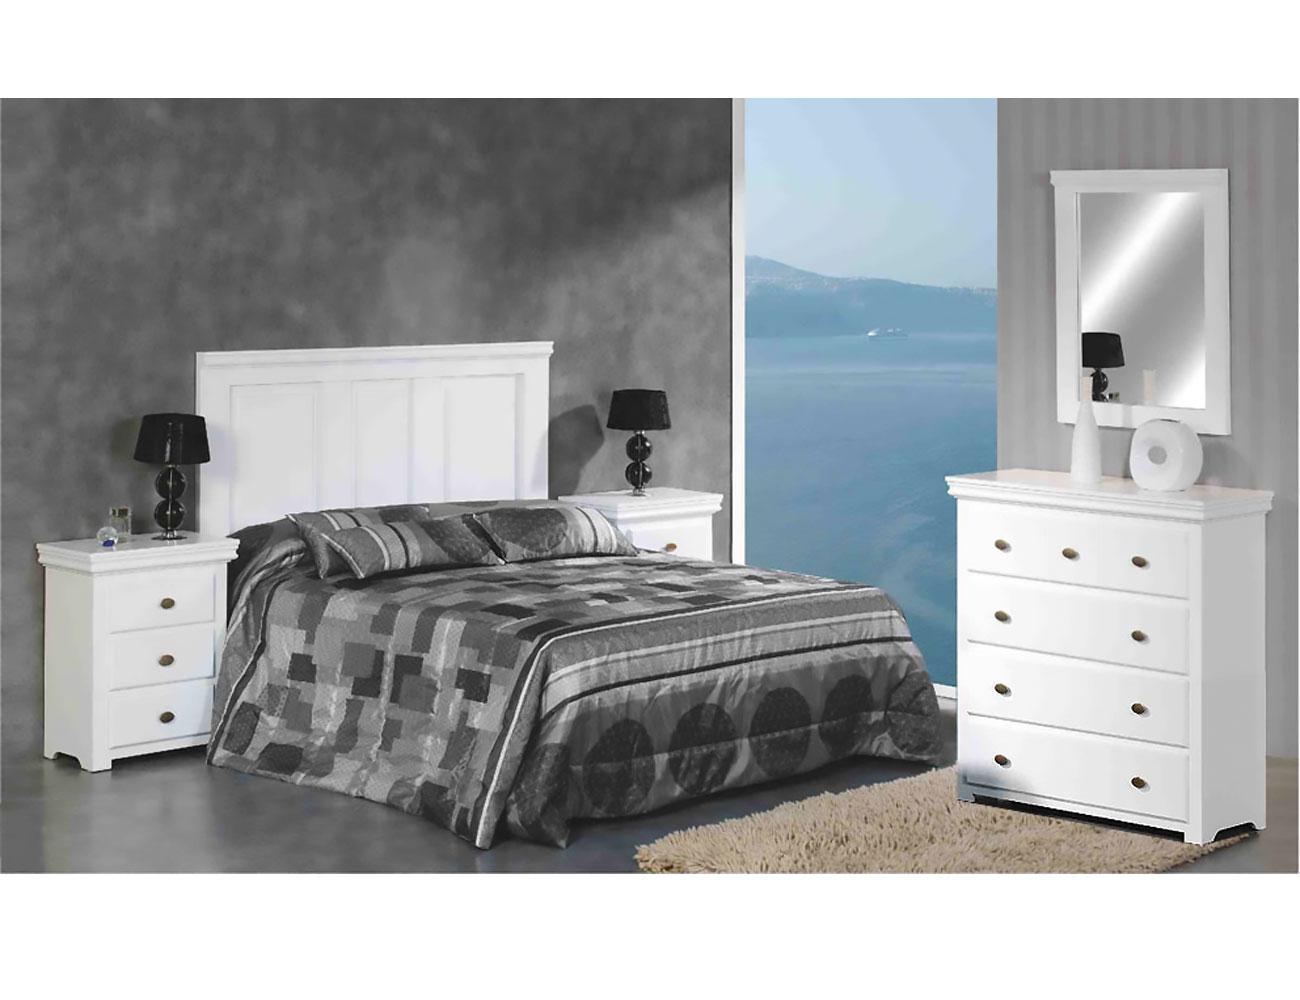 Dormitorio matrimonio comoda 5 c madera dm lacado blanco15